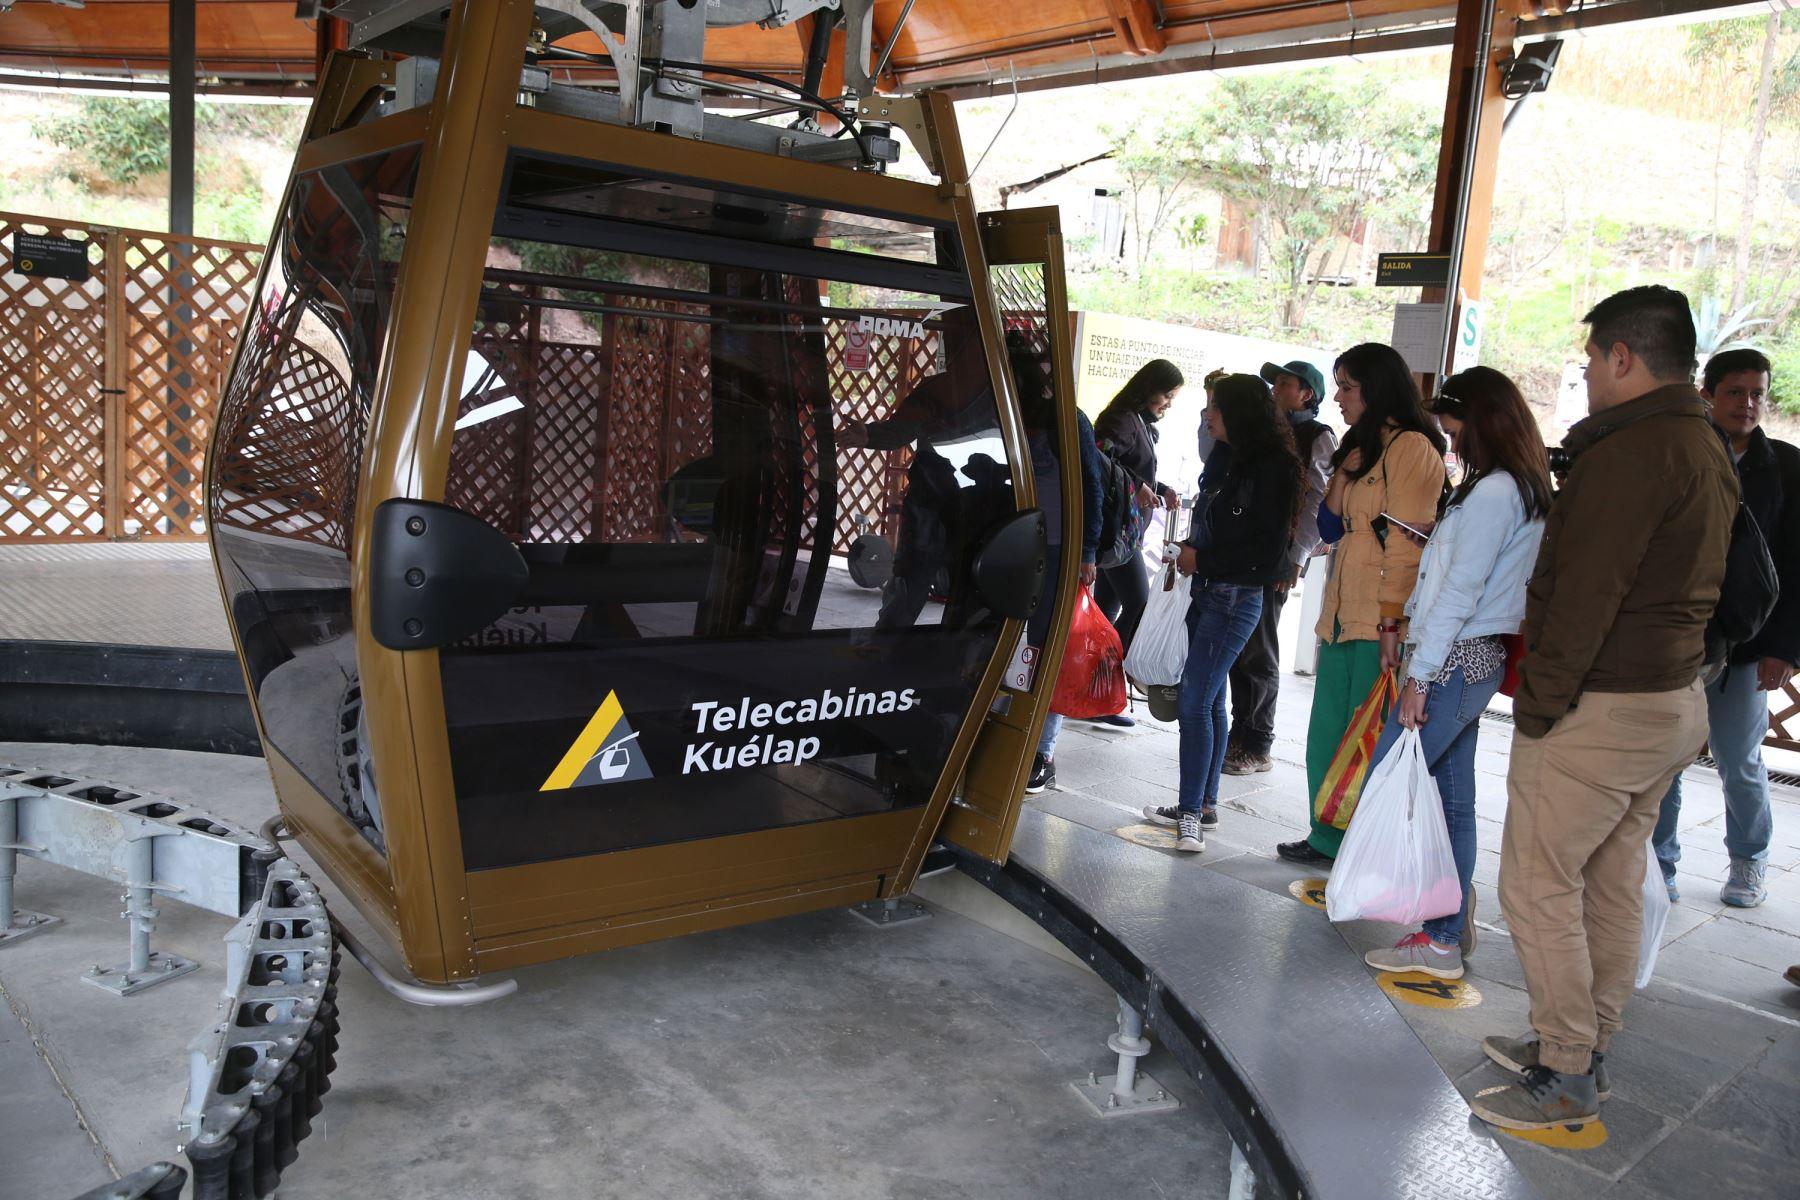 CHACHAPOYAS,PERÚ.  Telecabinas en Kuélap  Chachapoyas. Foto: ANDINA/Vídal Tarqui